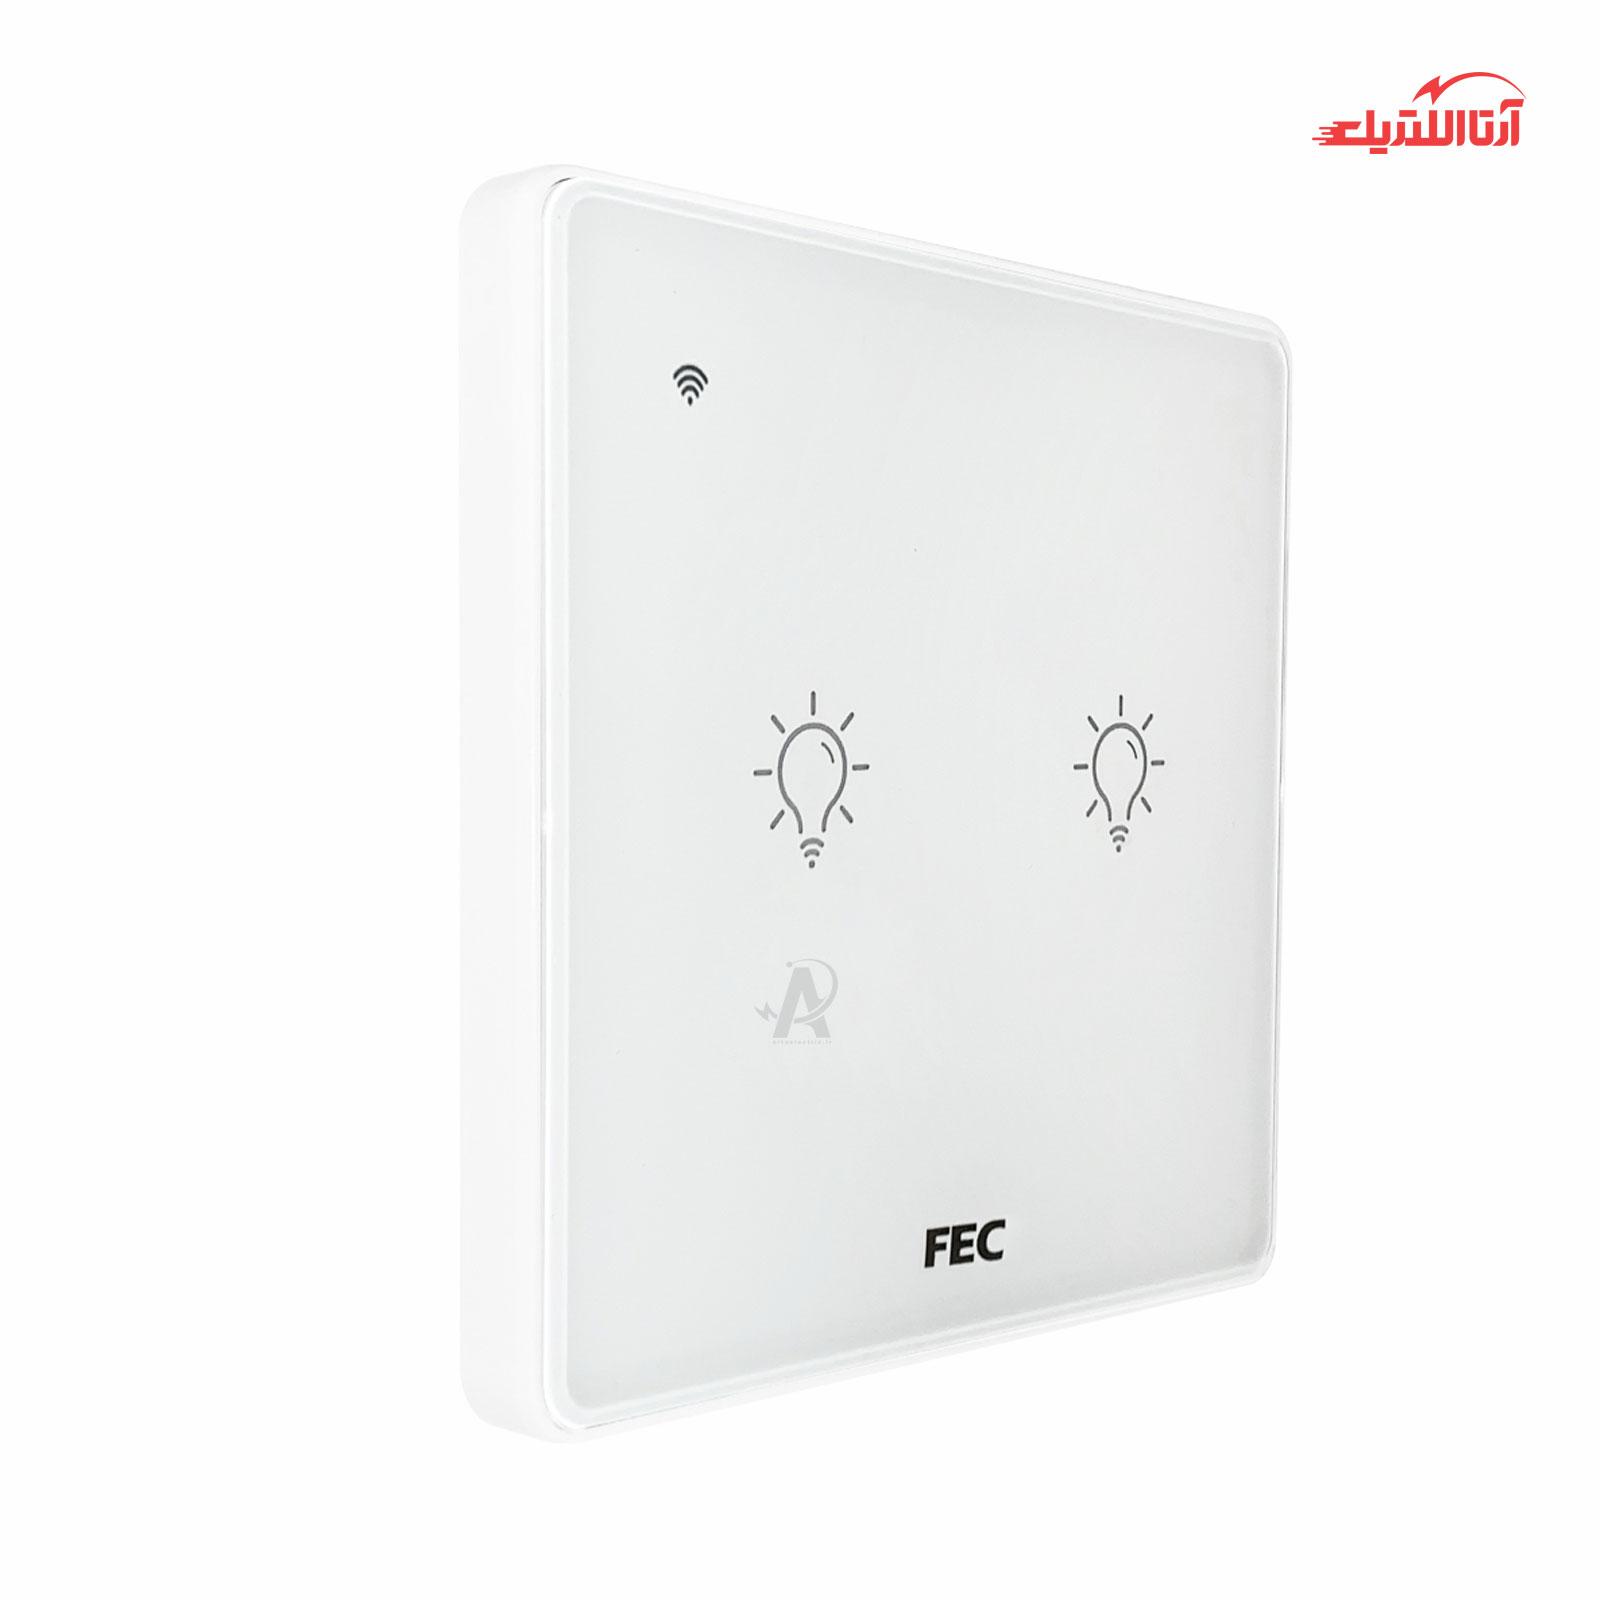 کلید لمسی دو پل هوشمند فاین الکتریک مدل FEC-SW-02